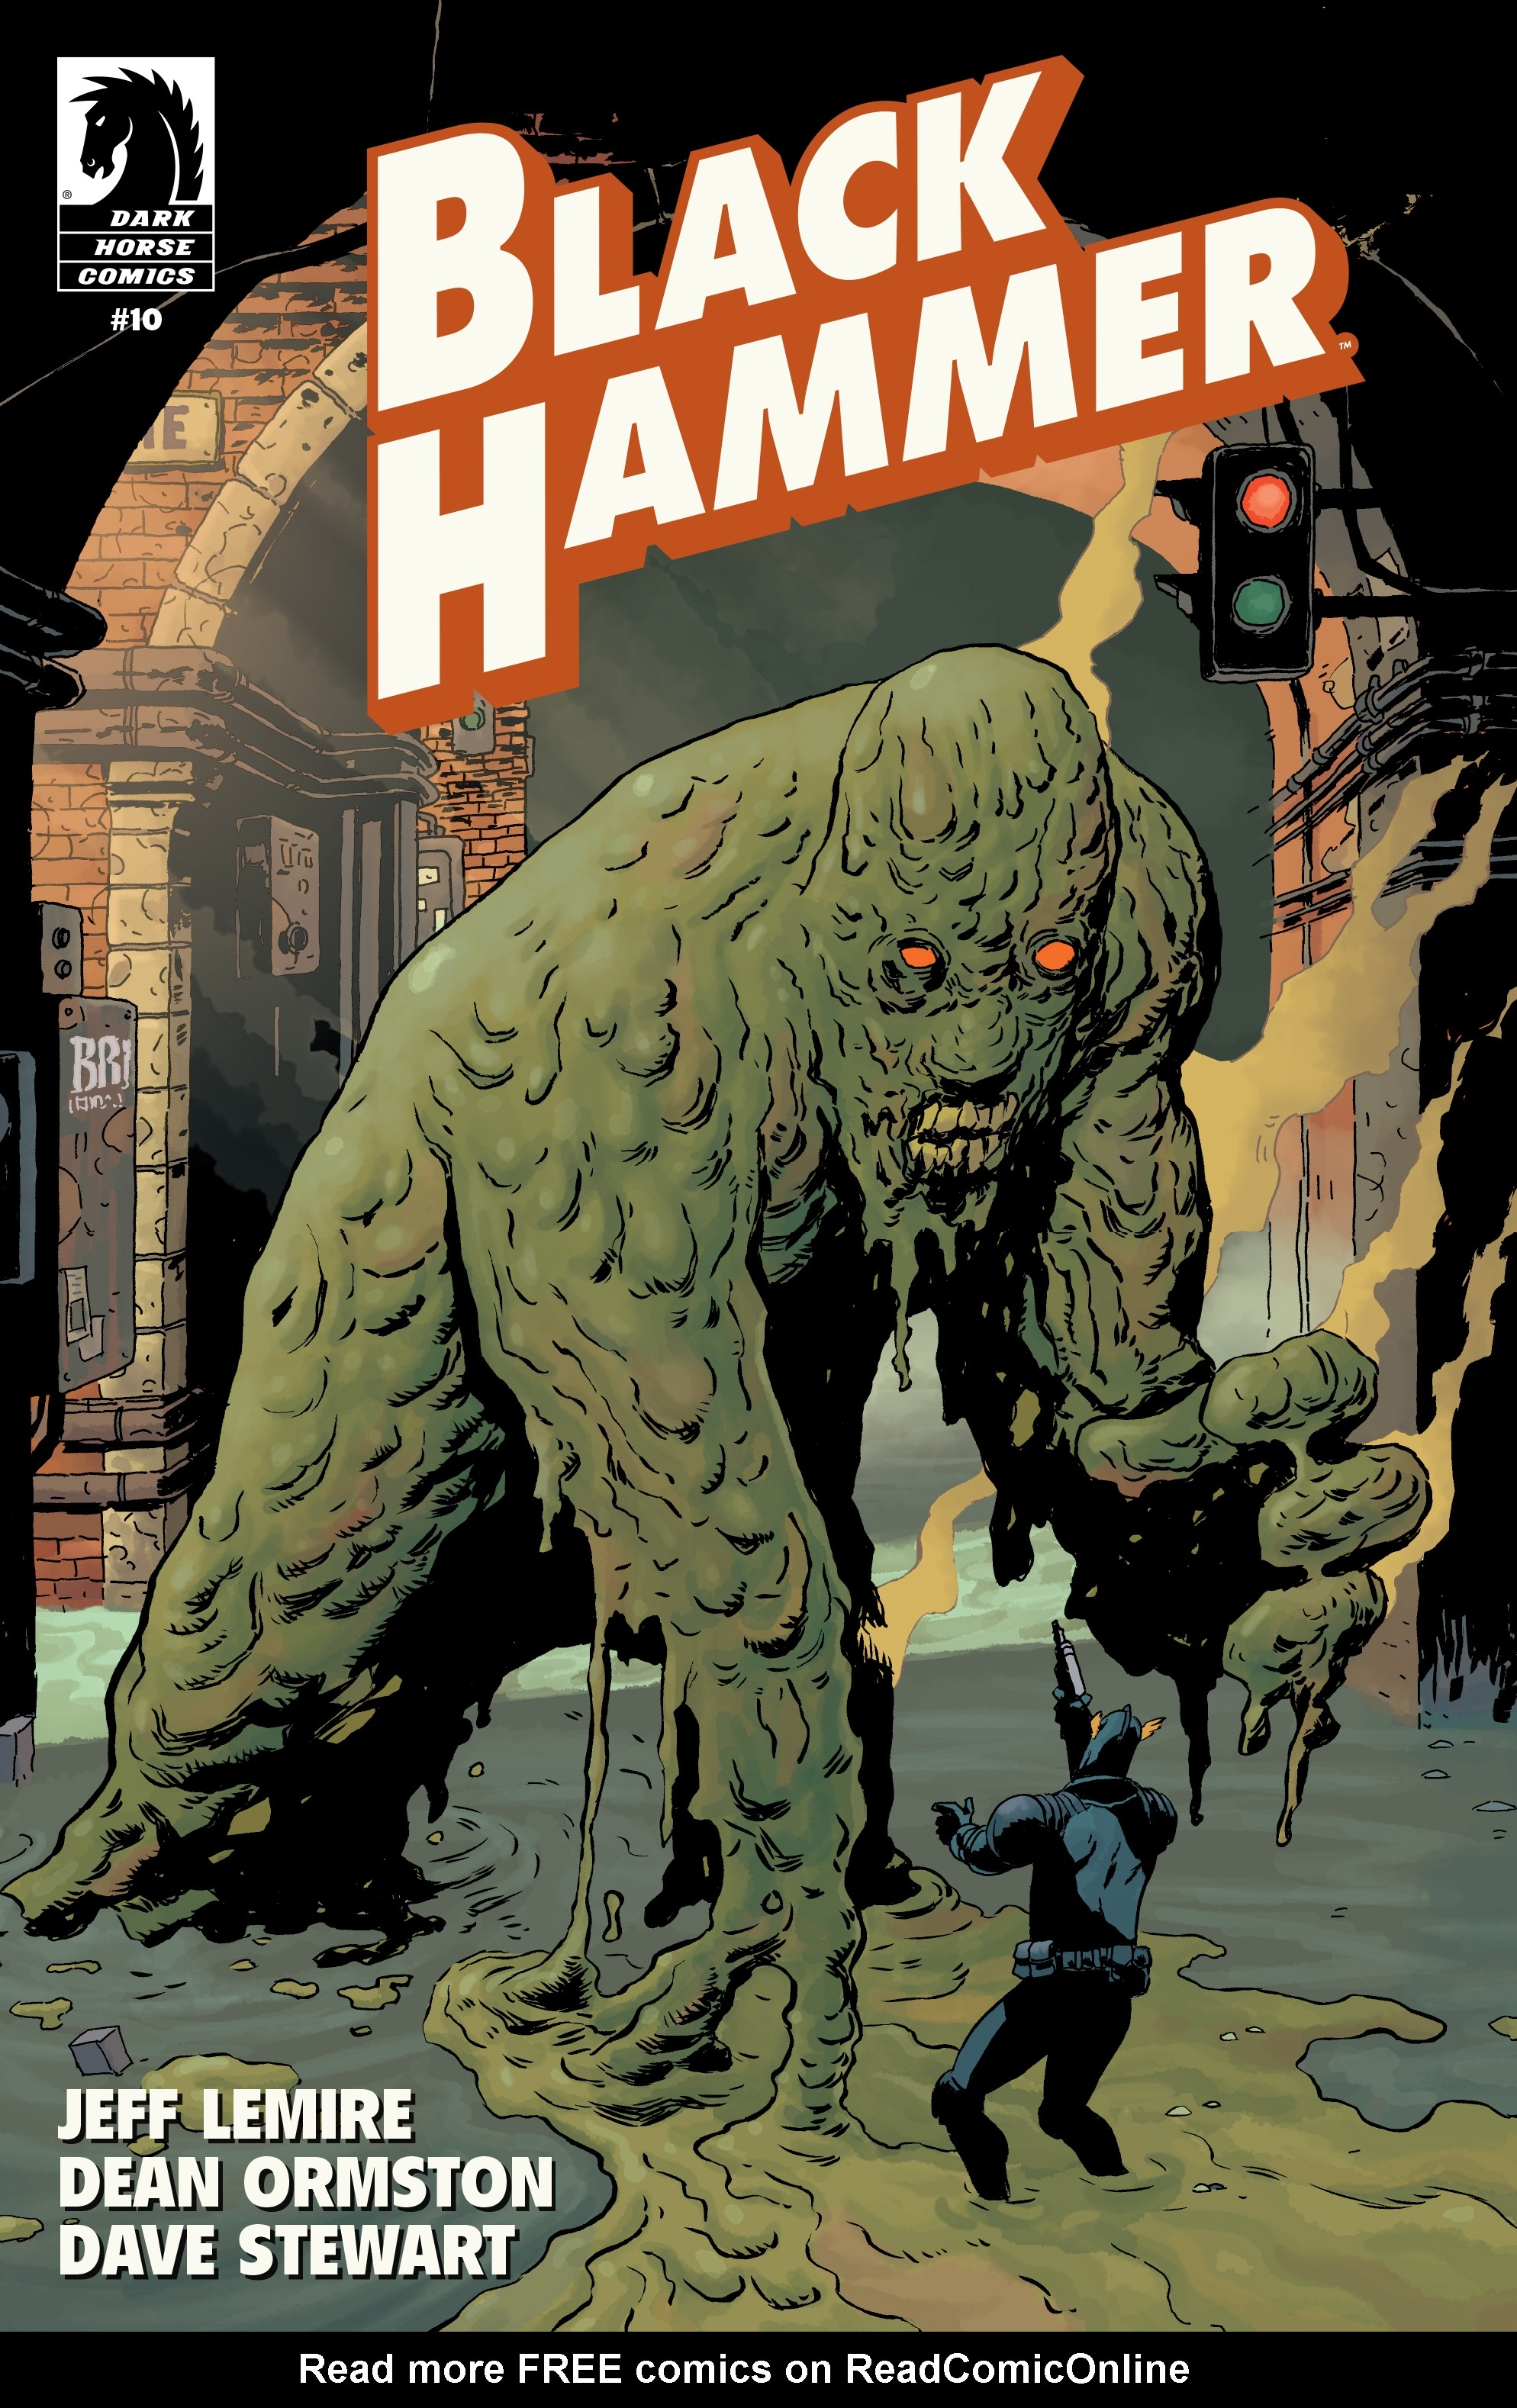 Read online Black Hammer comic -  Issue #10 - 1